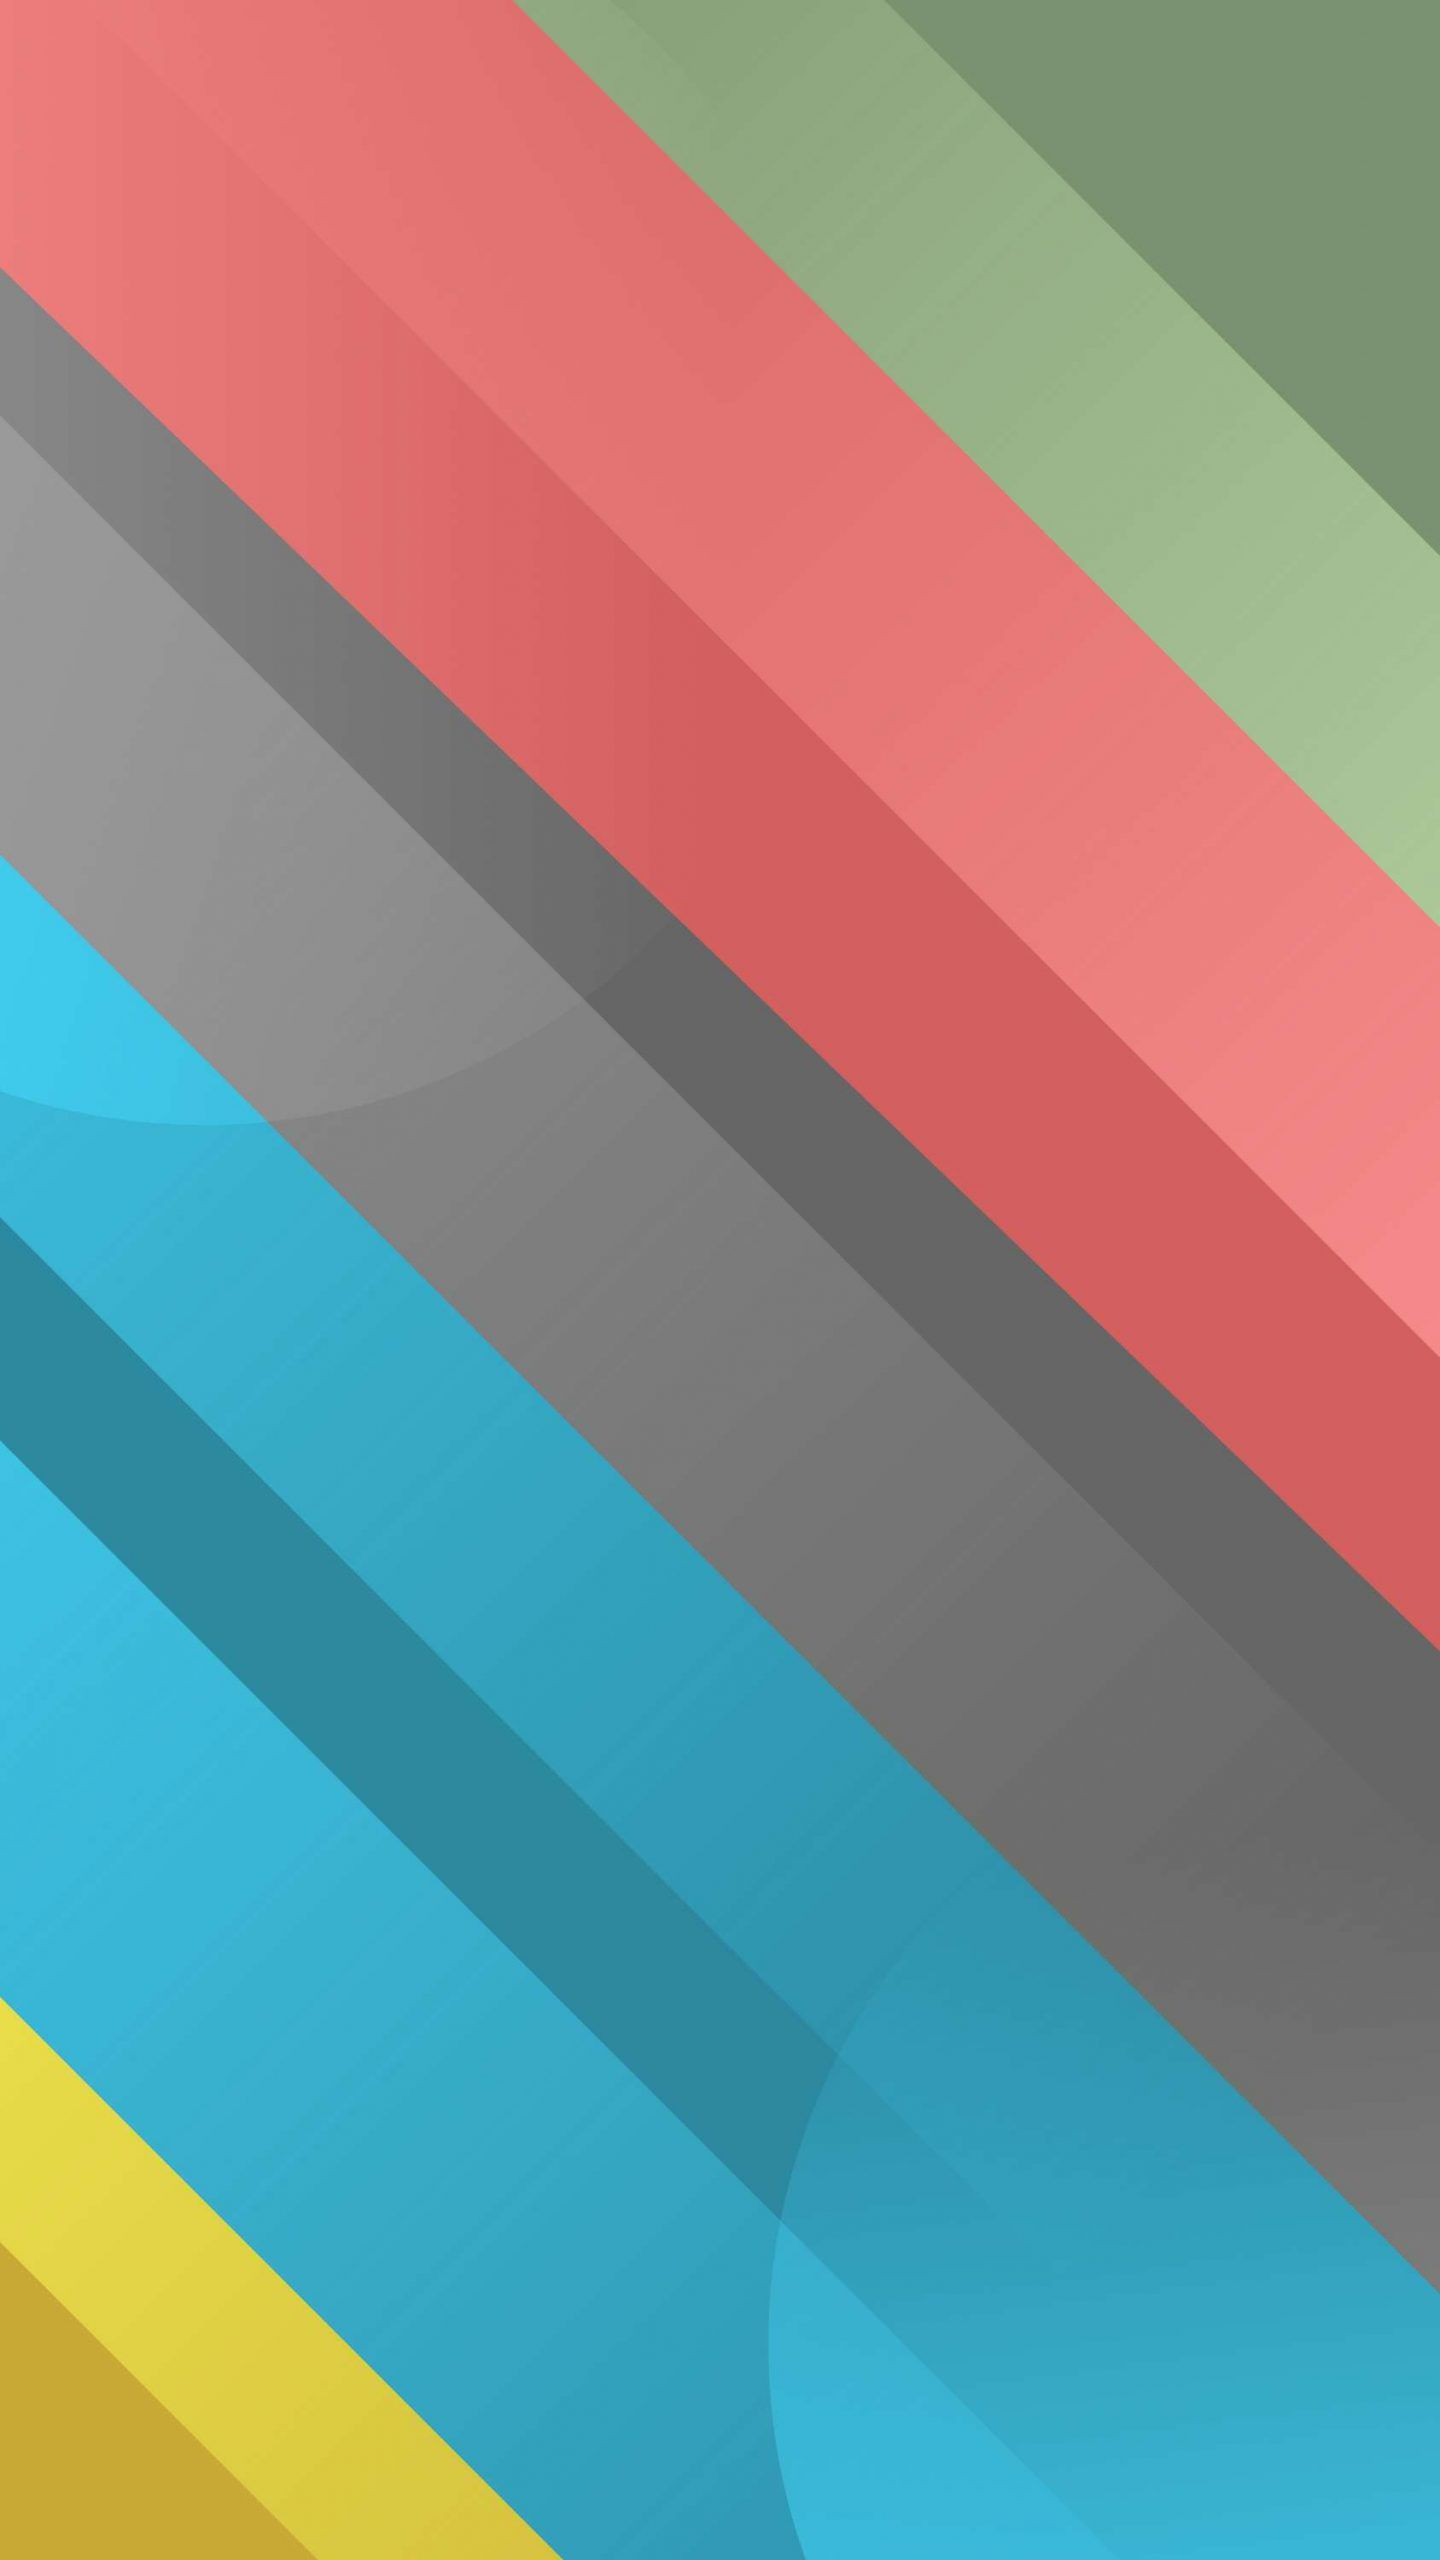 Minimal Color Lines iPhone Wallpaper